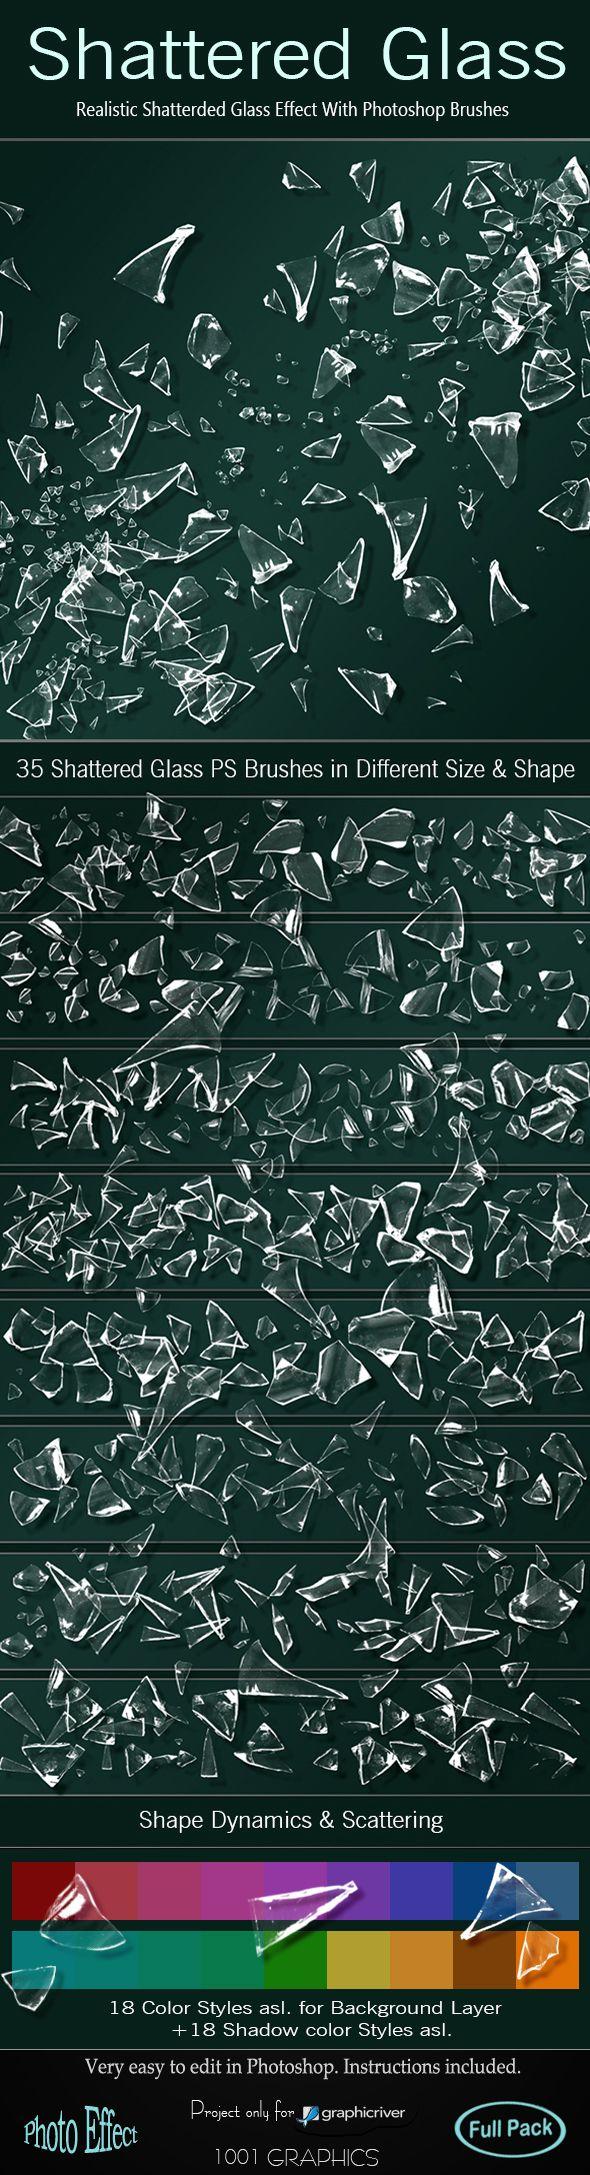 35 Shattered Glass Photoshop Brushes - Full Pack